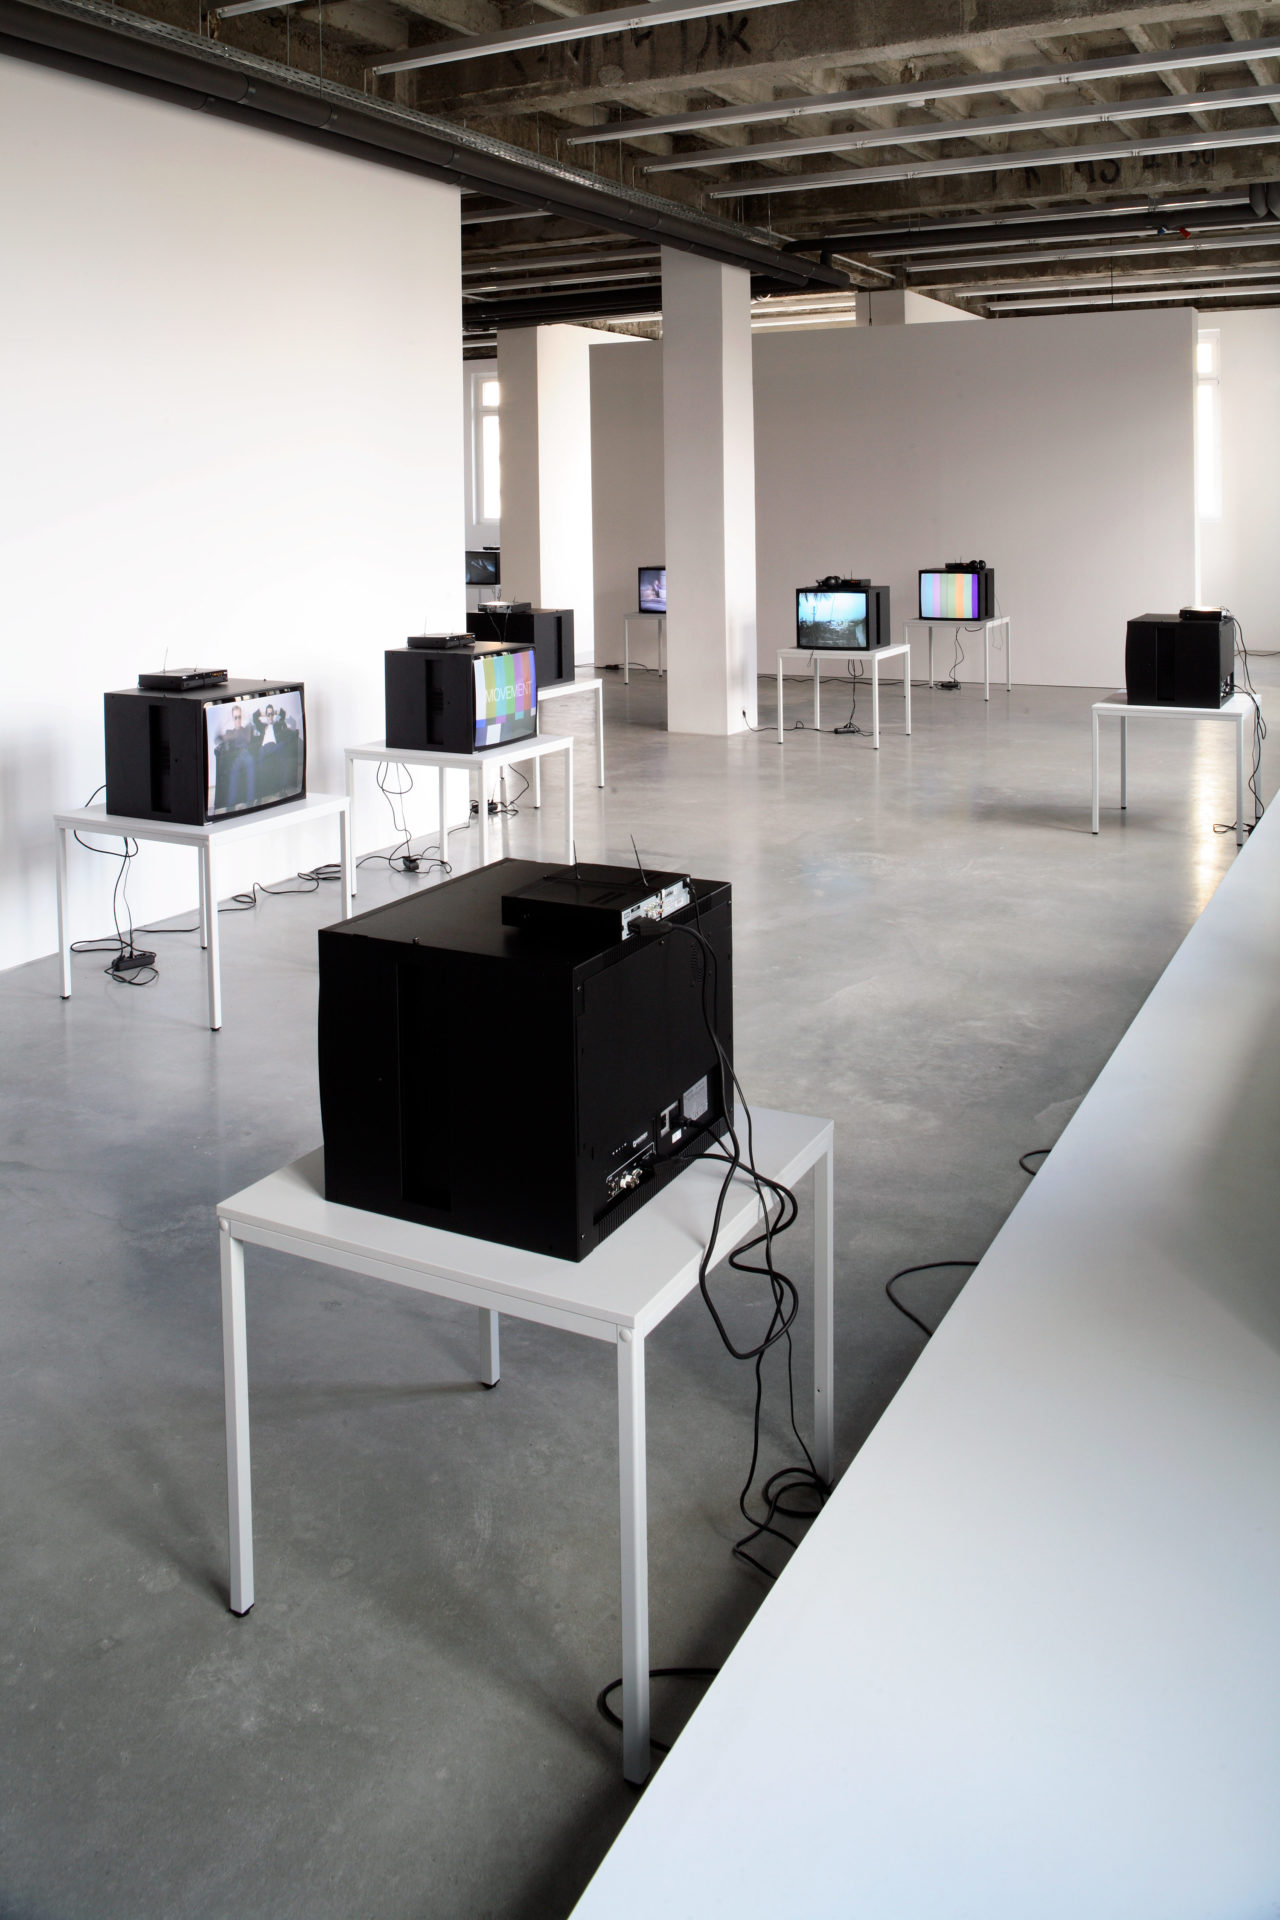 Heimo Zobernig: Video, Installation view